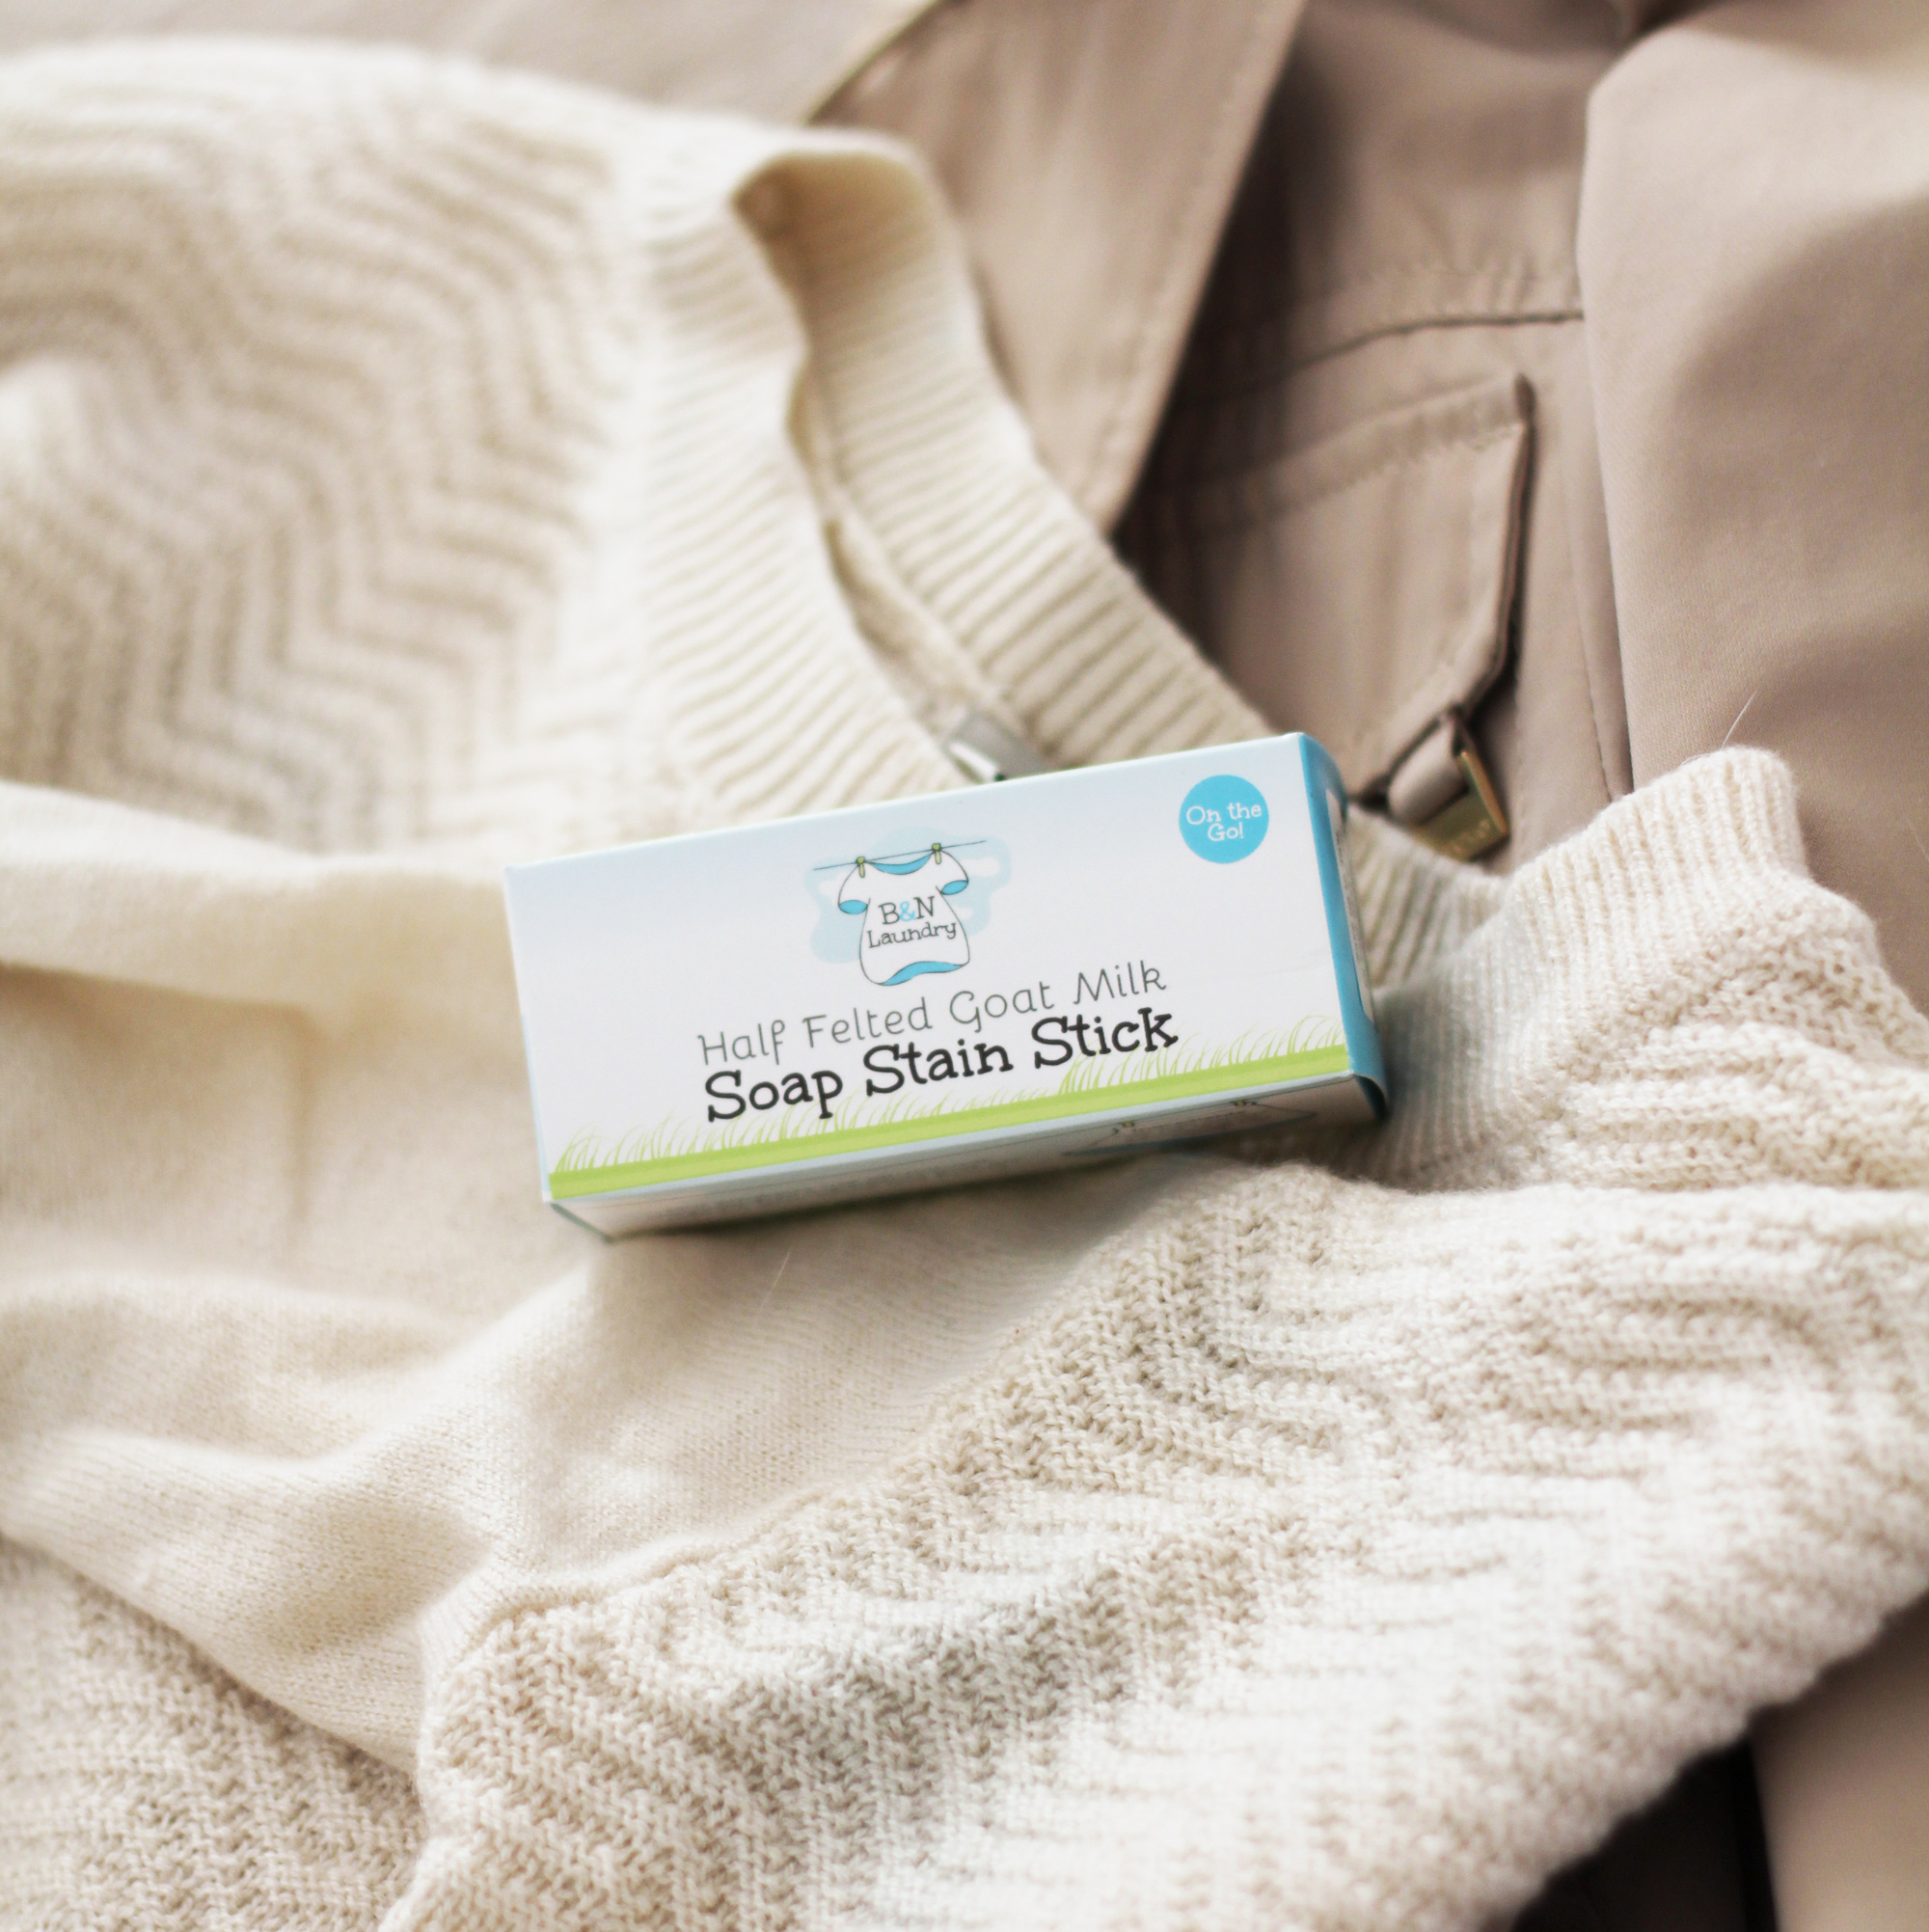 B&N Laundry Half Felted Goat Milk Soap Stain Stick — via Cotton Cashmere Cat Hair